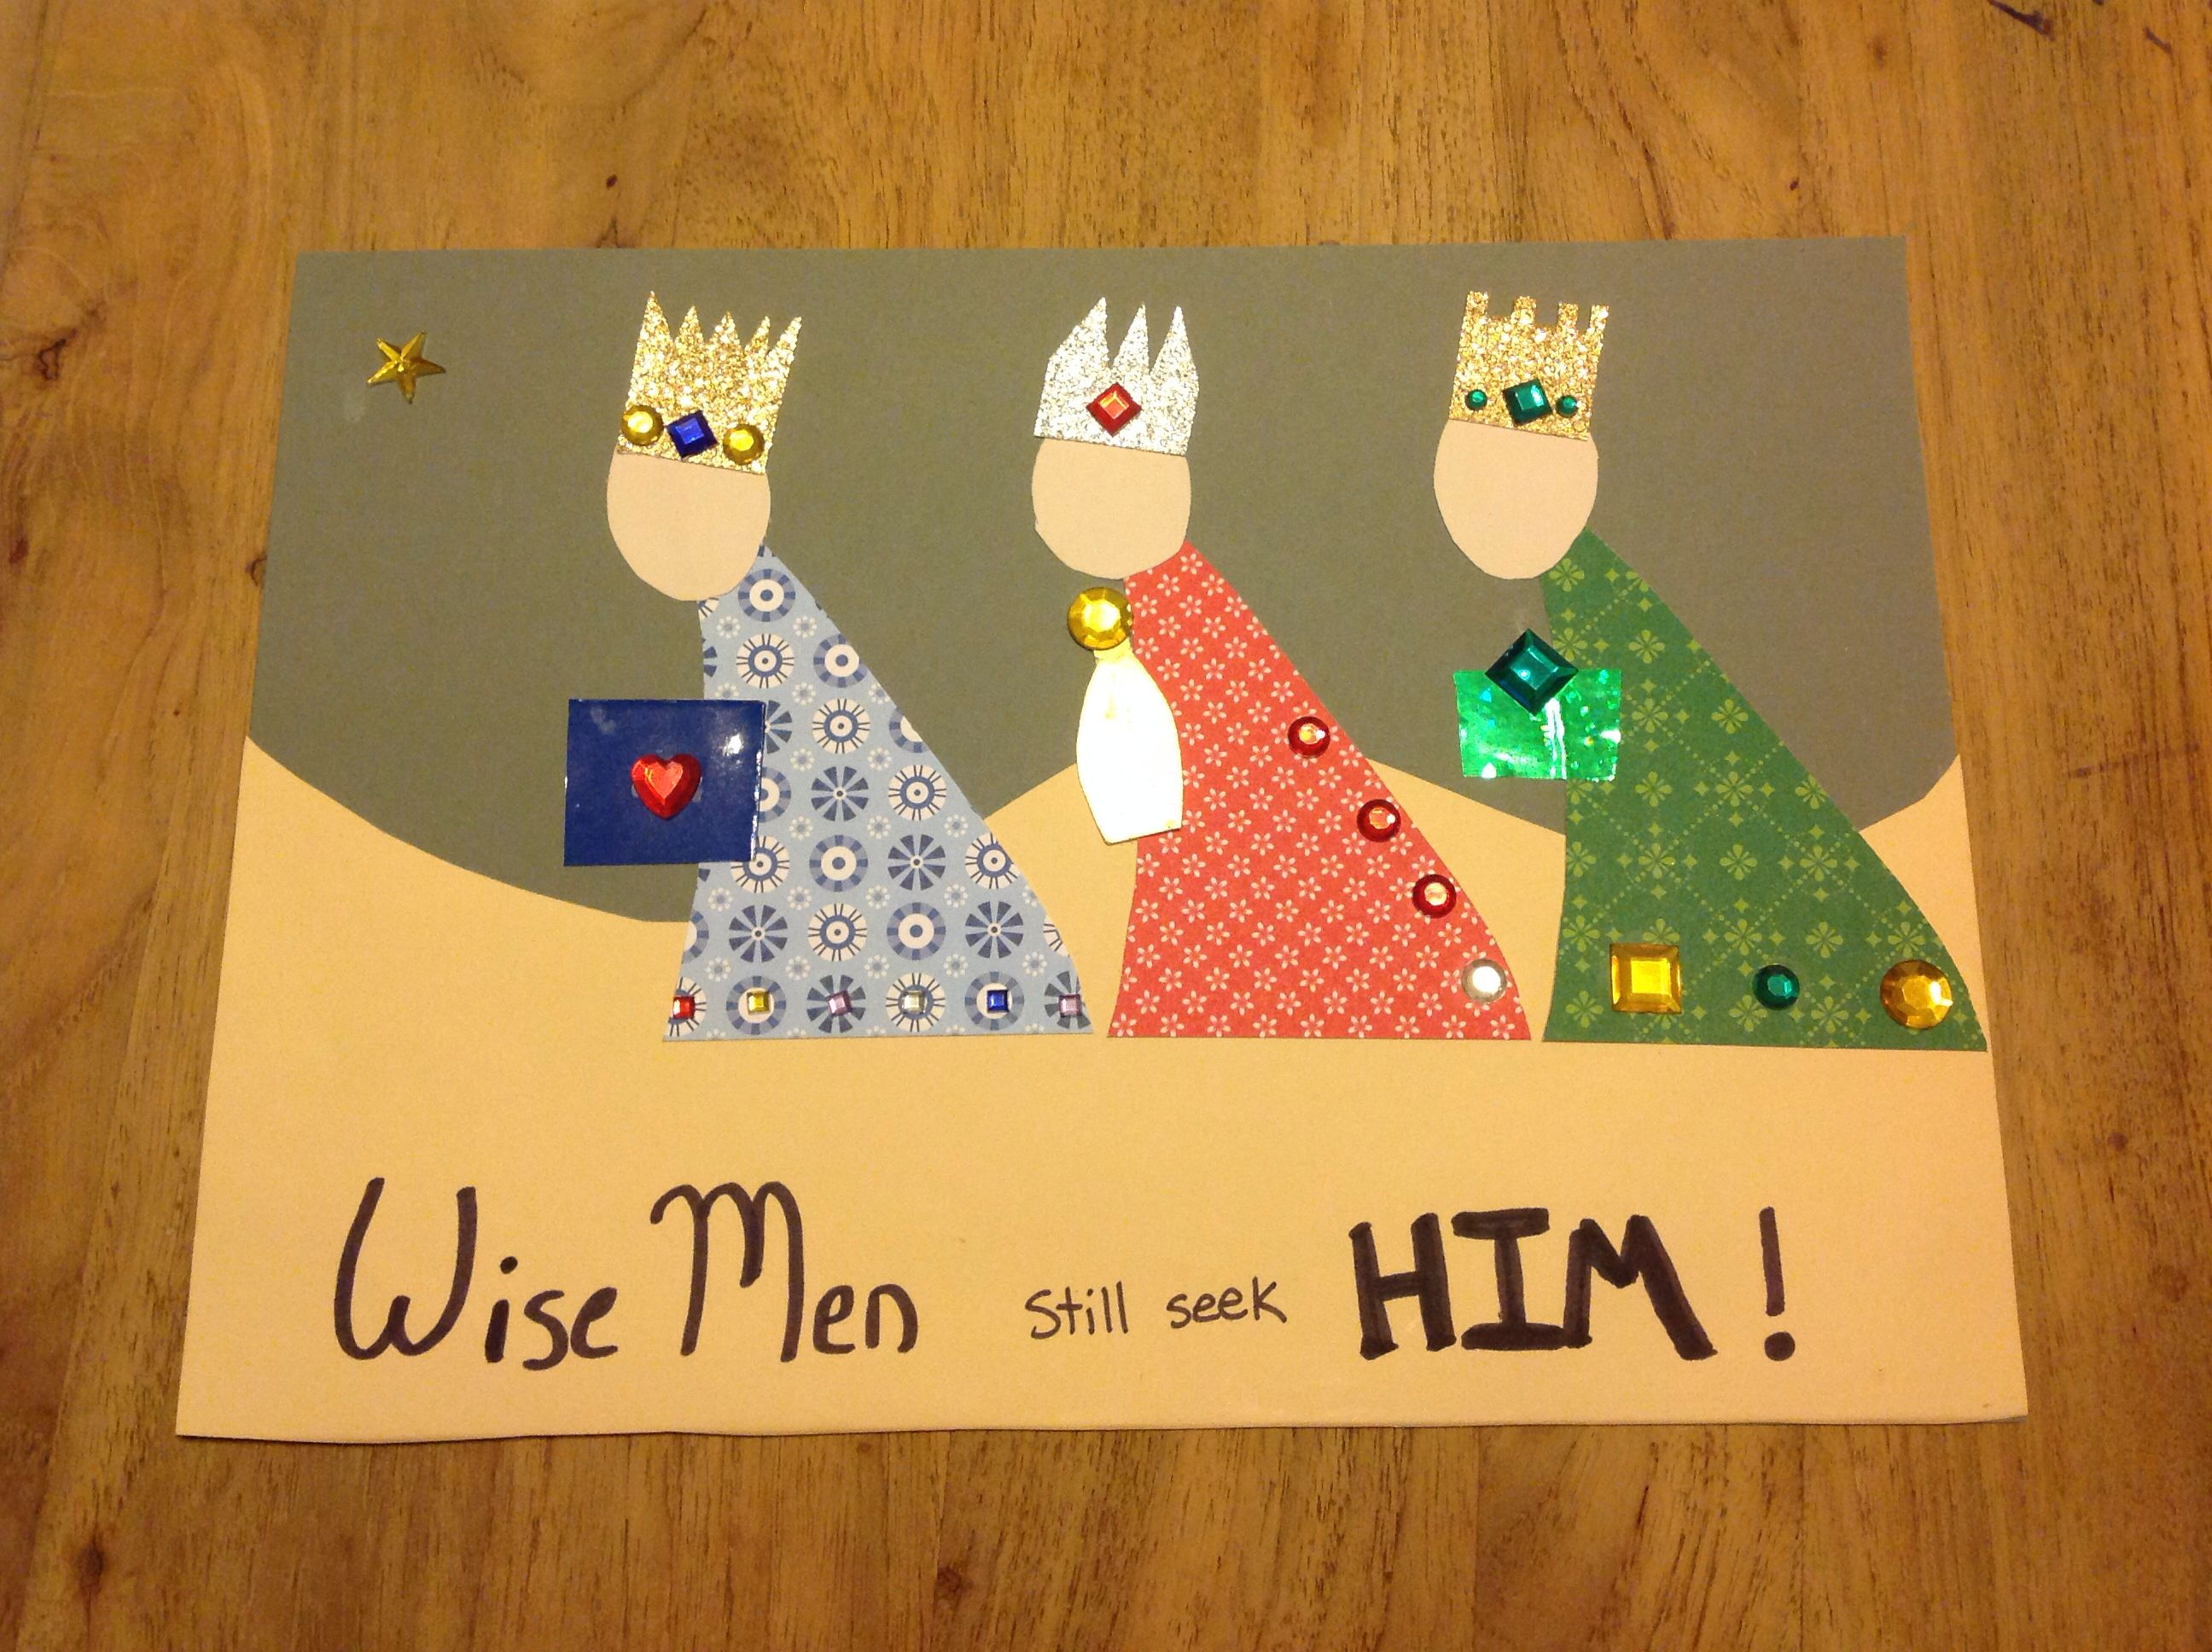 Wise men still seek HIM Theme for this month kids church